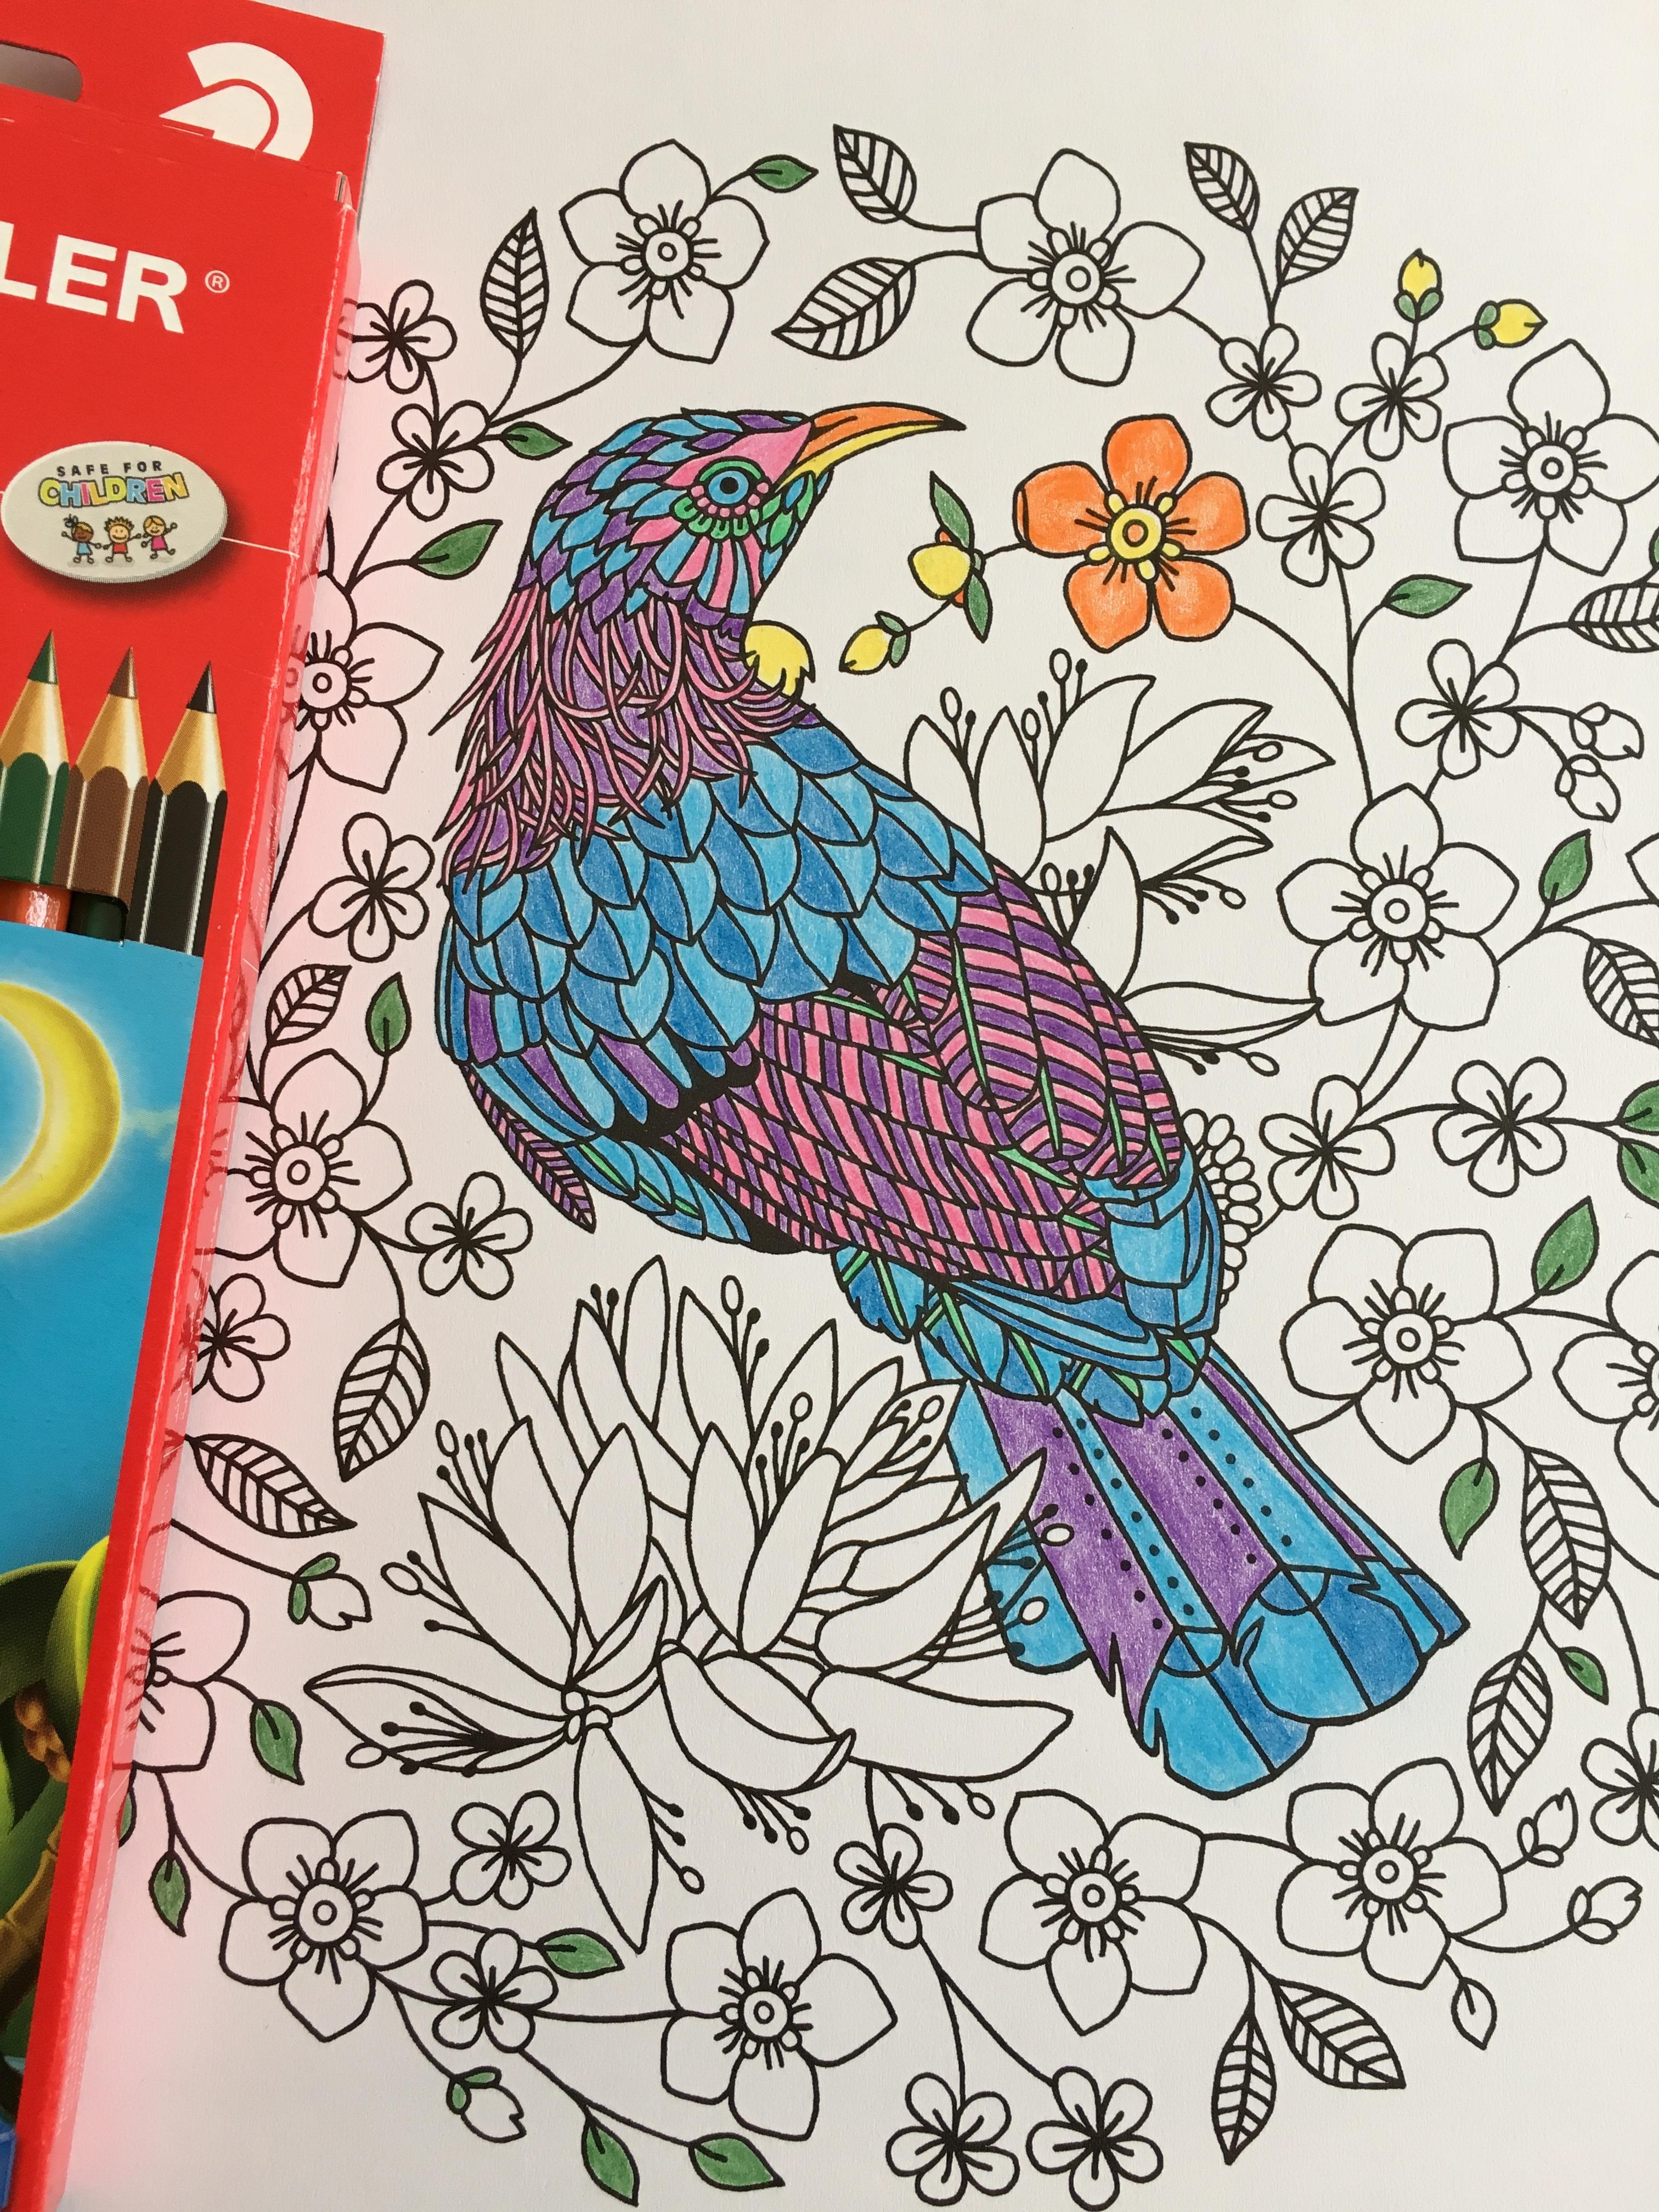 Gambar Pensil Kreatif Burung Ungu Pola Bersantai Warna